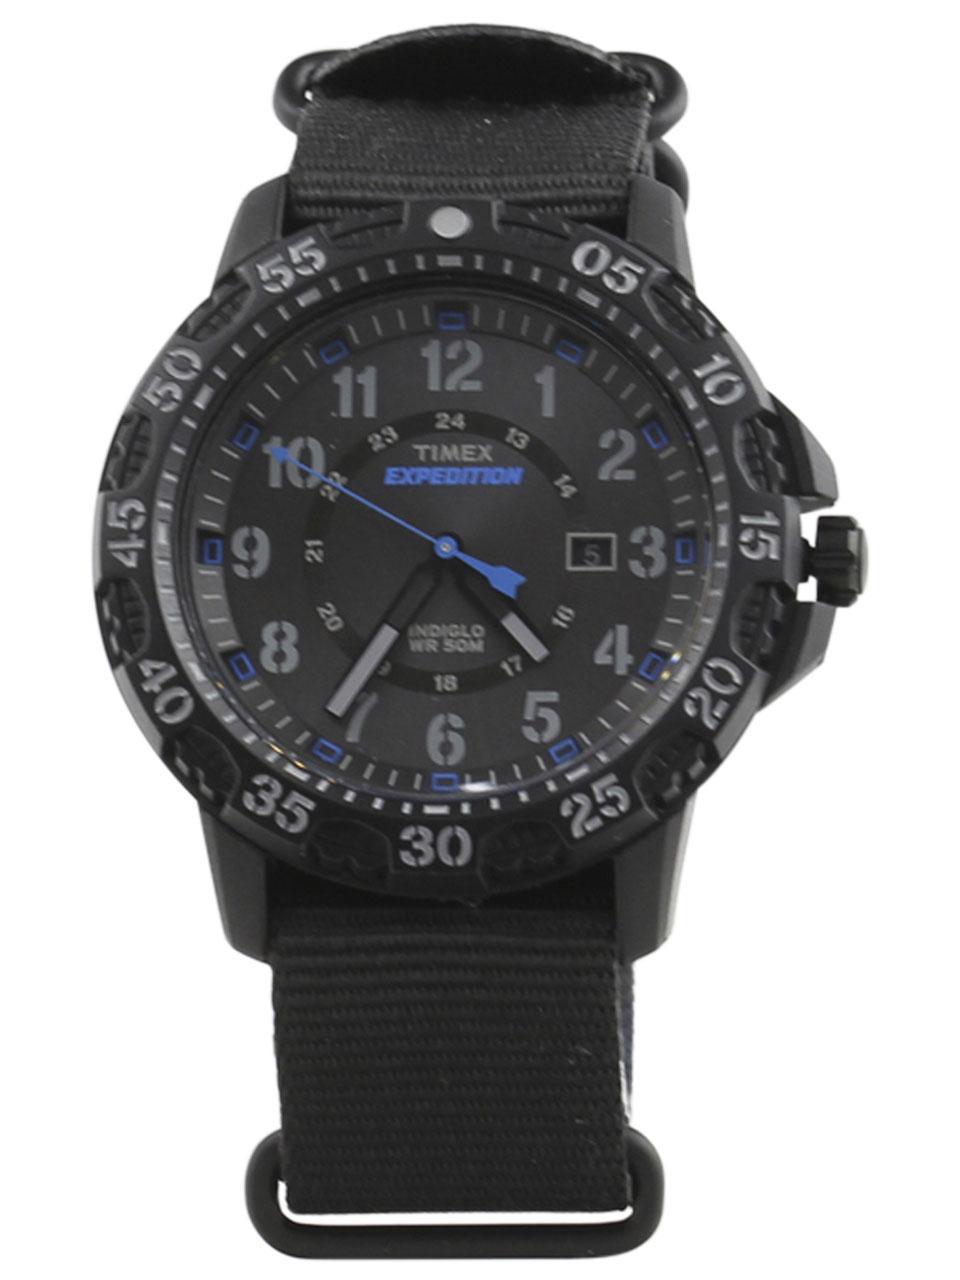 Timex Men s TW4B03500 Expedition Gallatin Black Blue Analog Watch